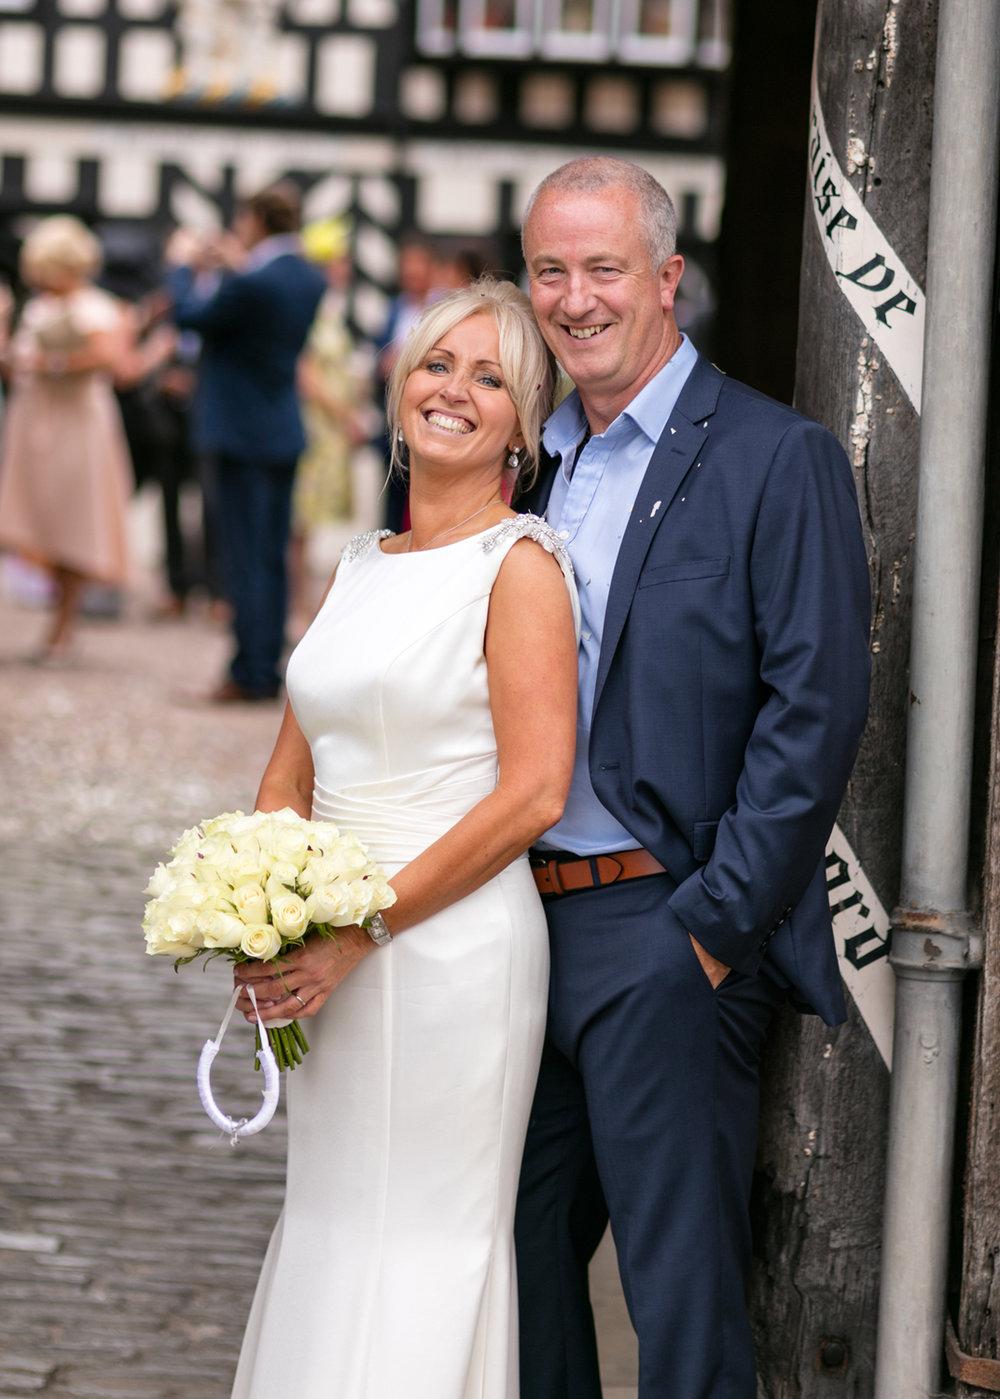 Wedding-Photography-Lord-Leycester-Hospital24.jpg